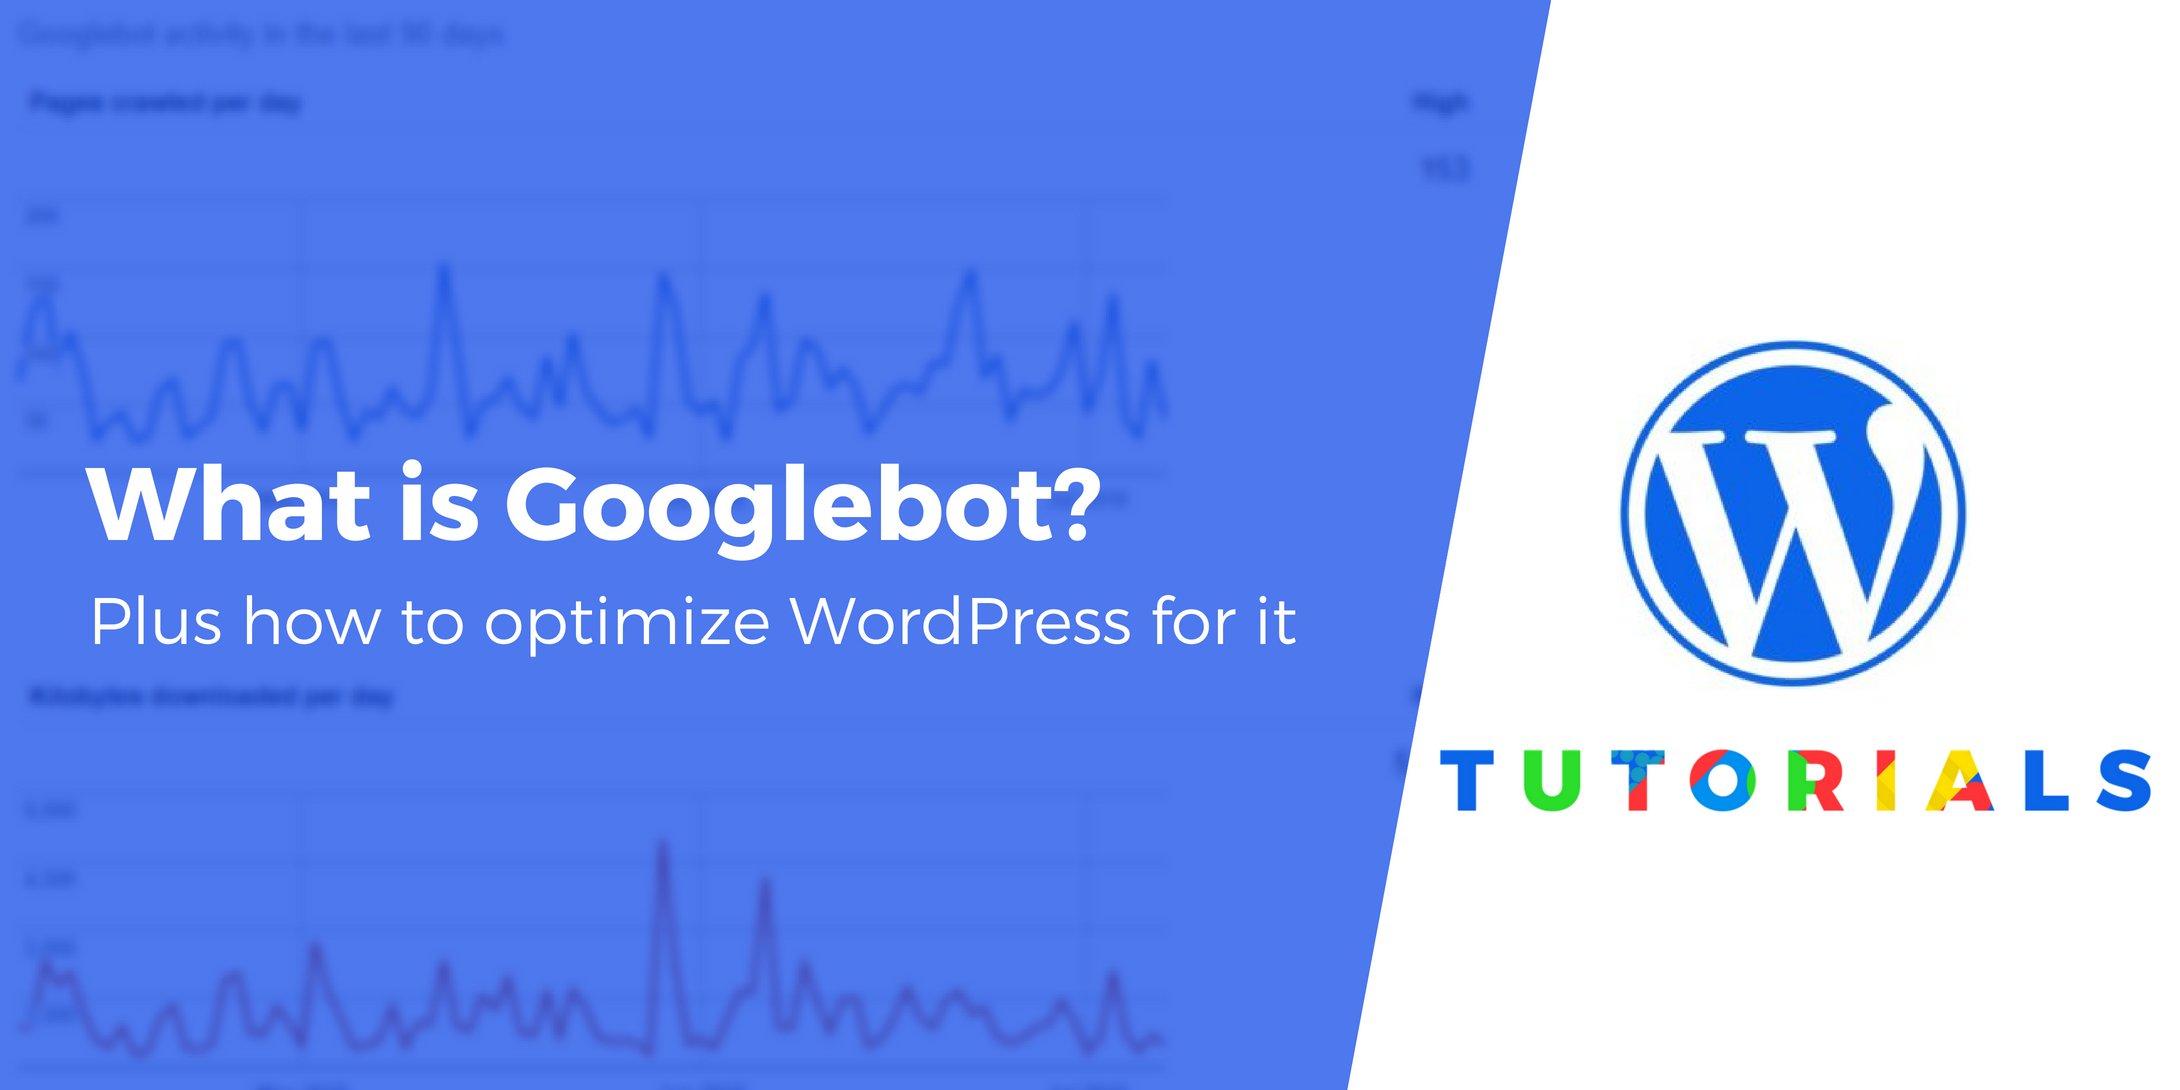 What Is Googlebot?